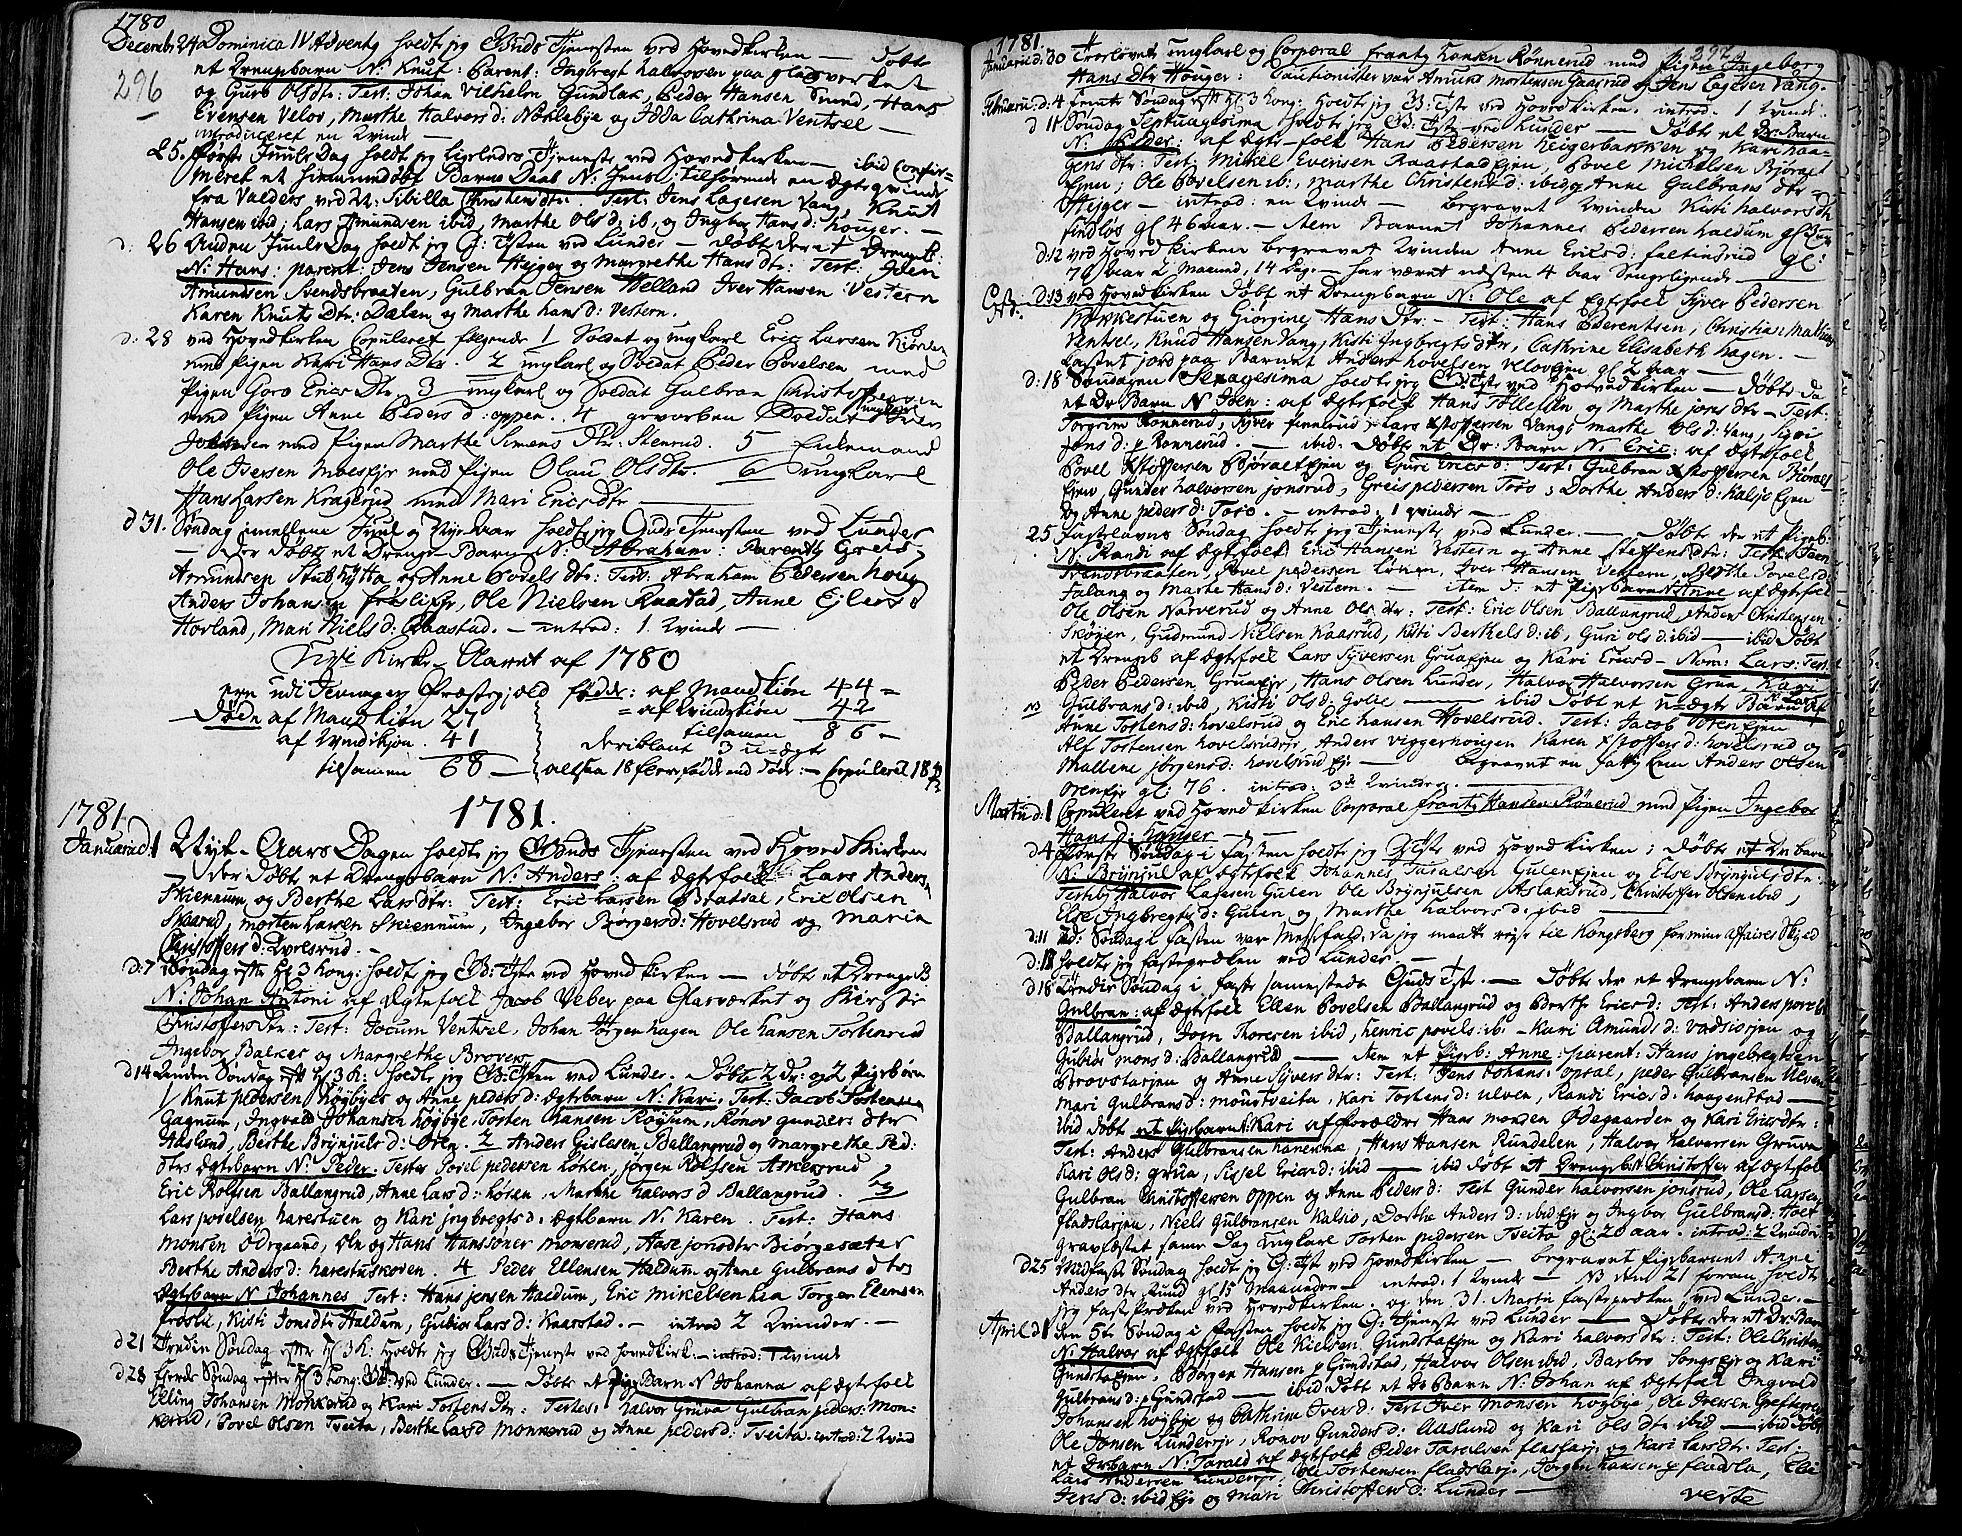 SAH, Jevnaker prestekontor, Ministerialbok nr. 3, 1752-1799, s. 296-297